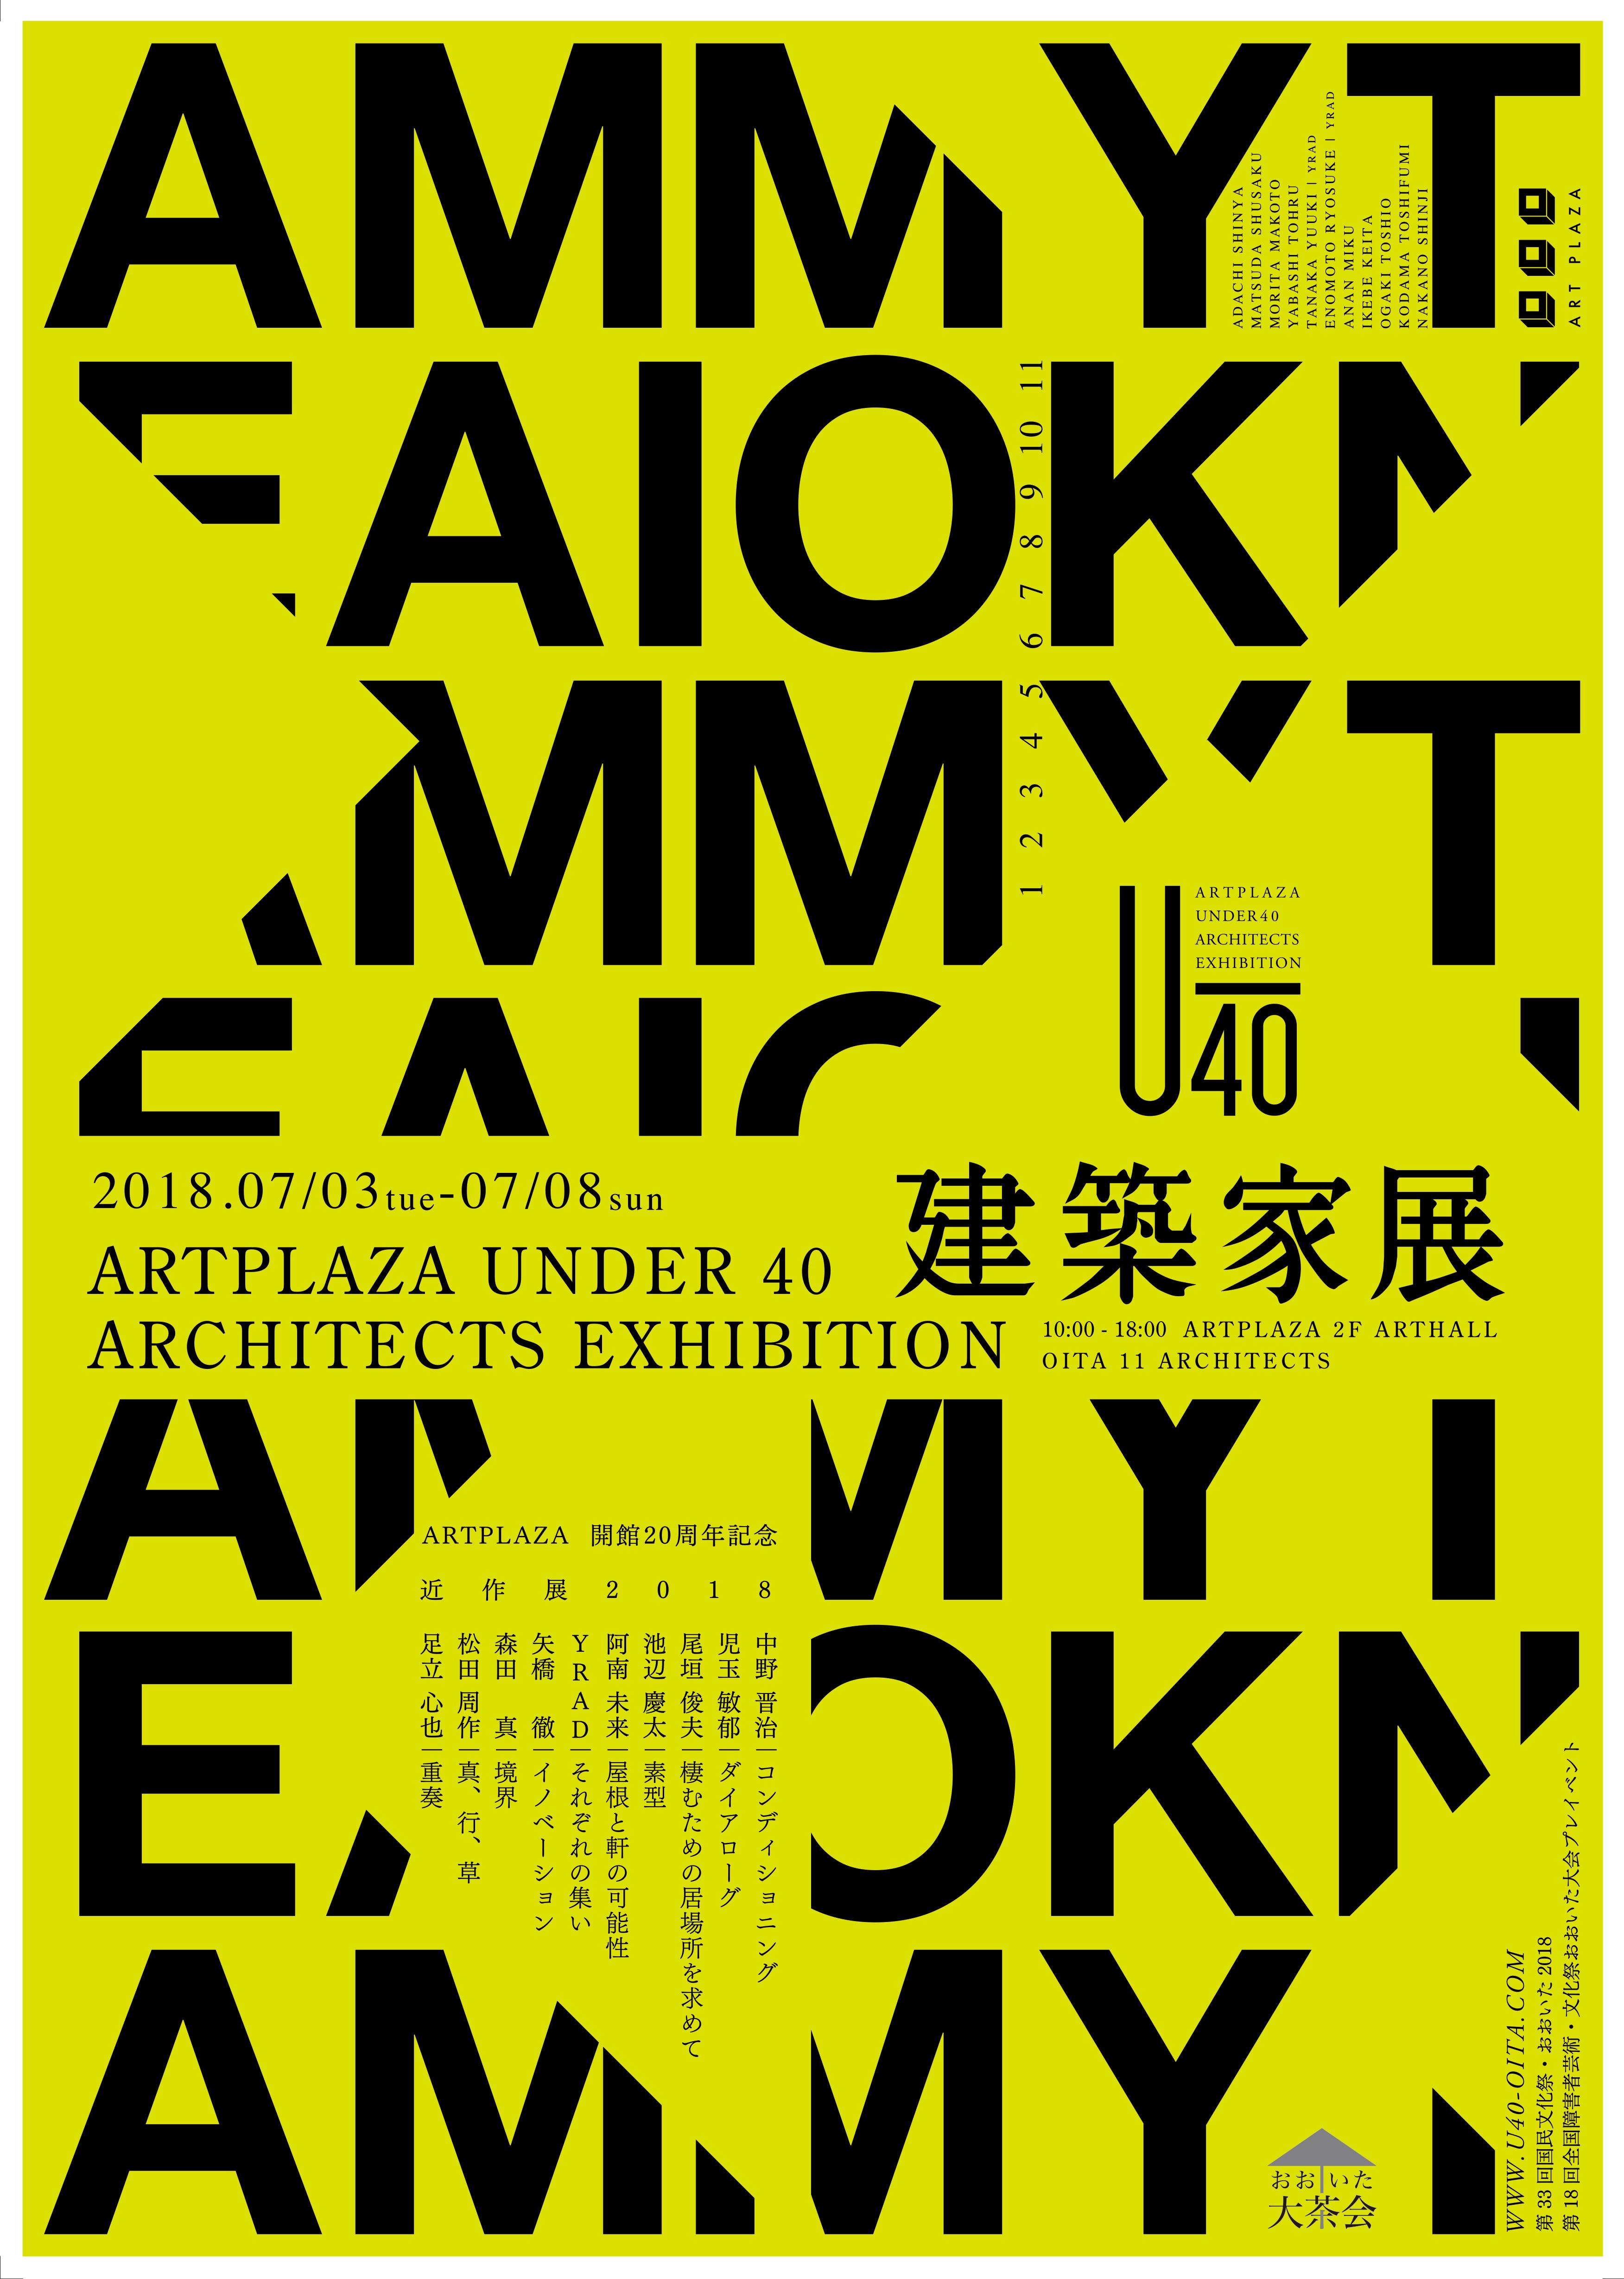 「ARTPLAZA開館20周年記念 ARTPLAZA U_40建築家展2018」 2018.07.03-2018.07.08